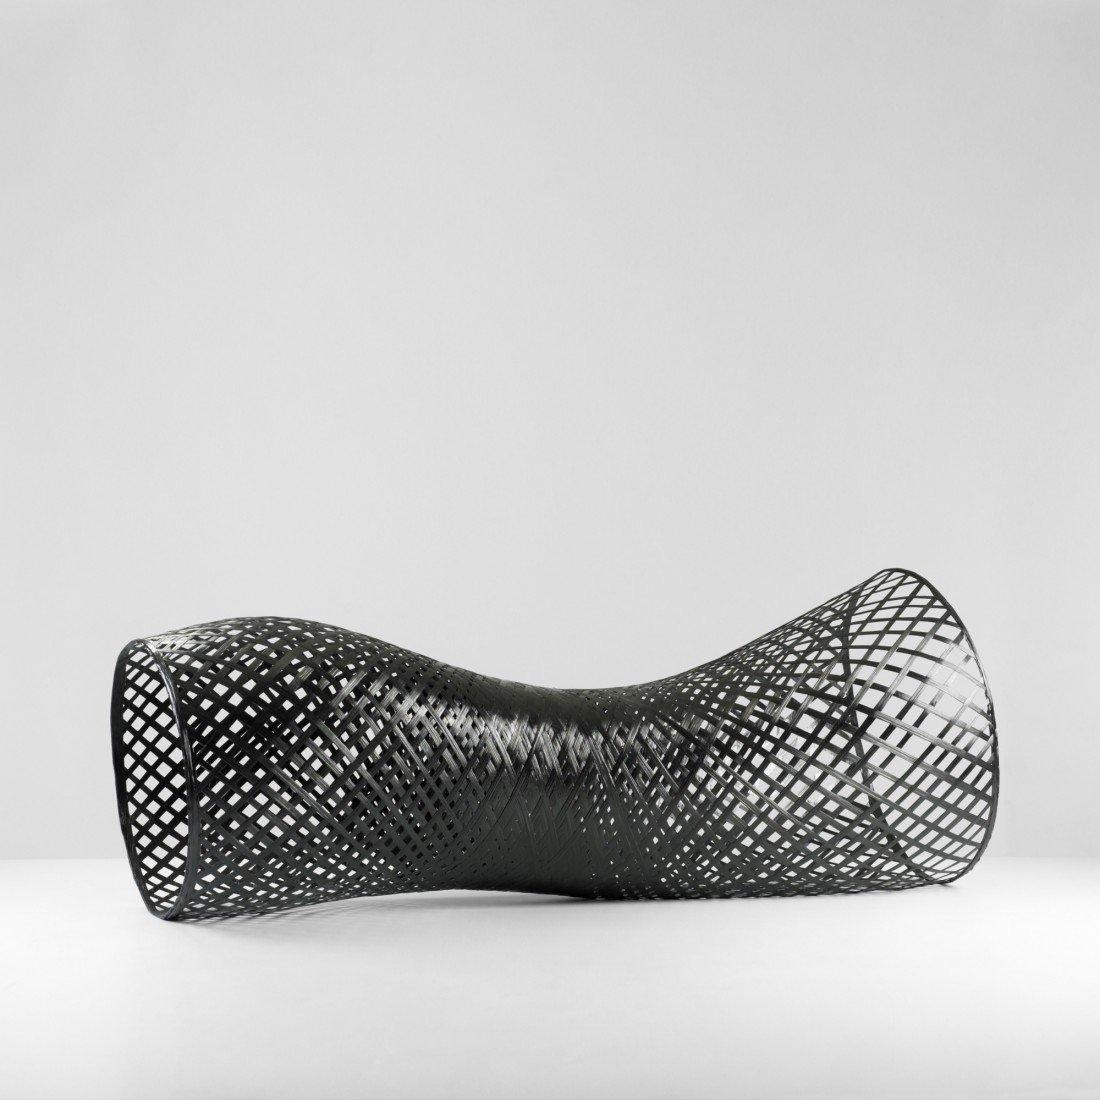 114: Mathias Bengtsson Spun chaise lounge